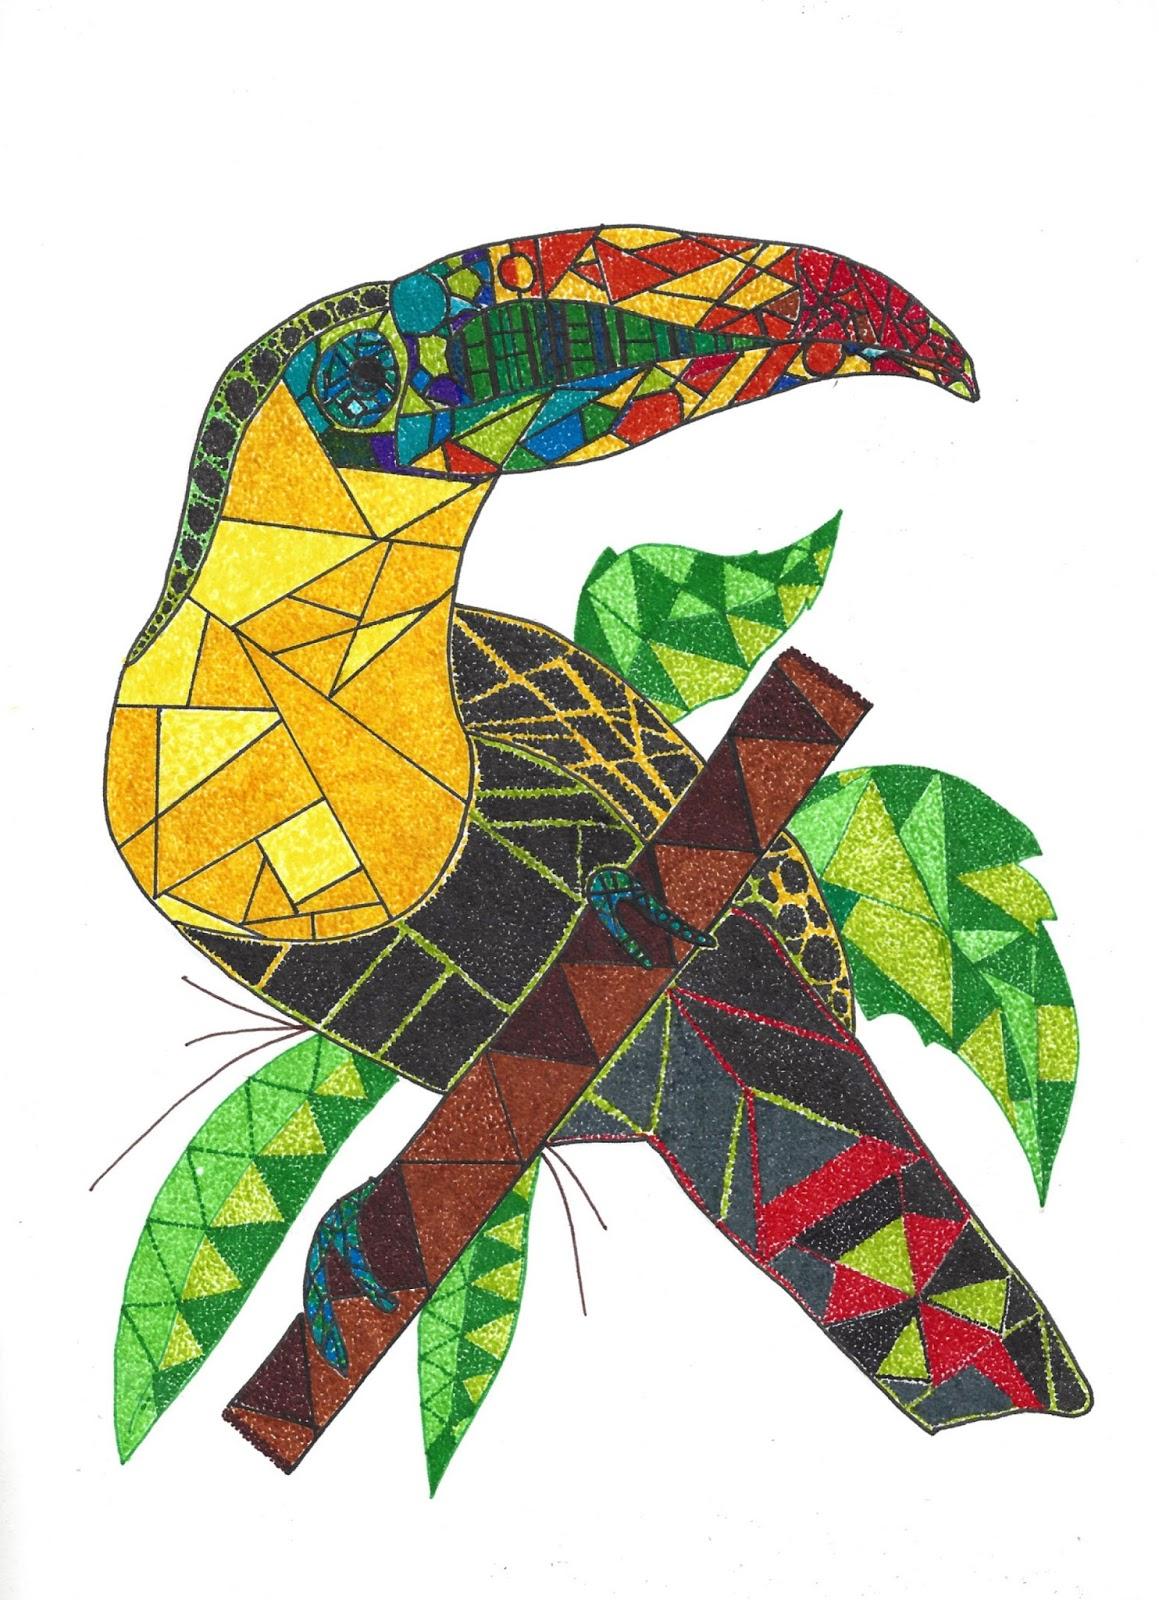 Kuiloa Blog de Dibujo : Geometrización en el Dibujo (2)